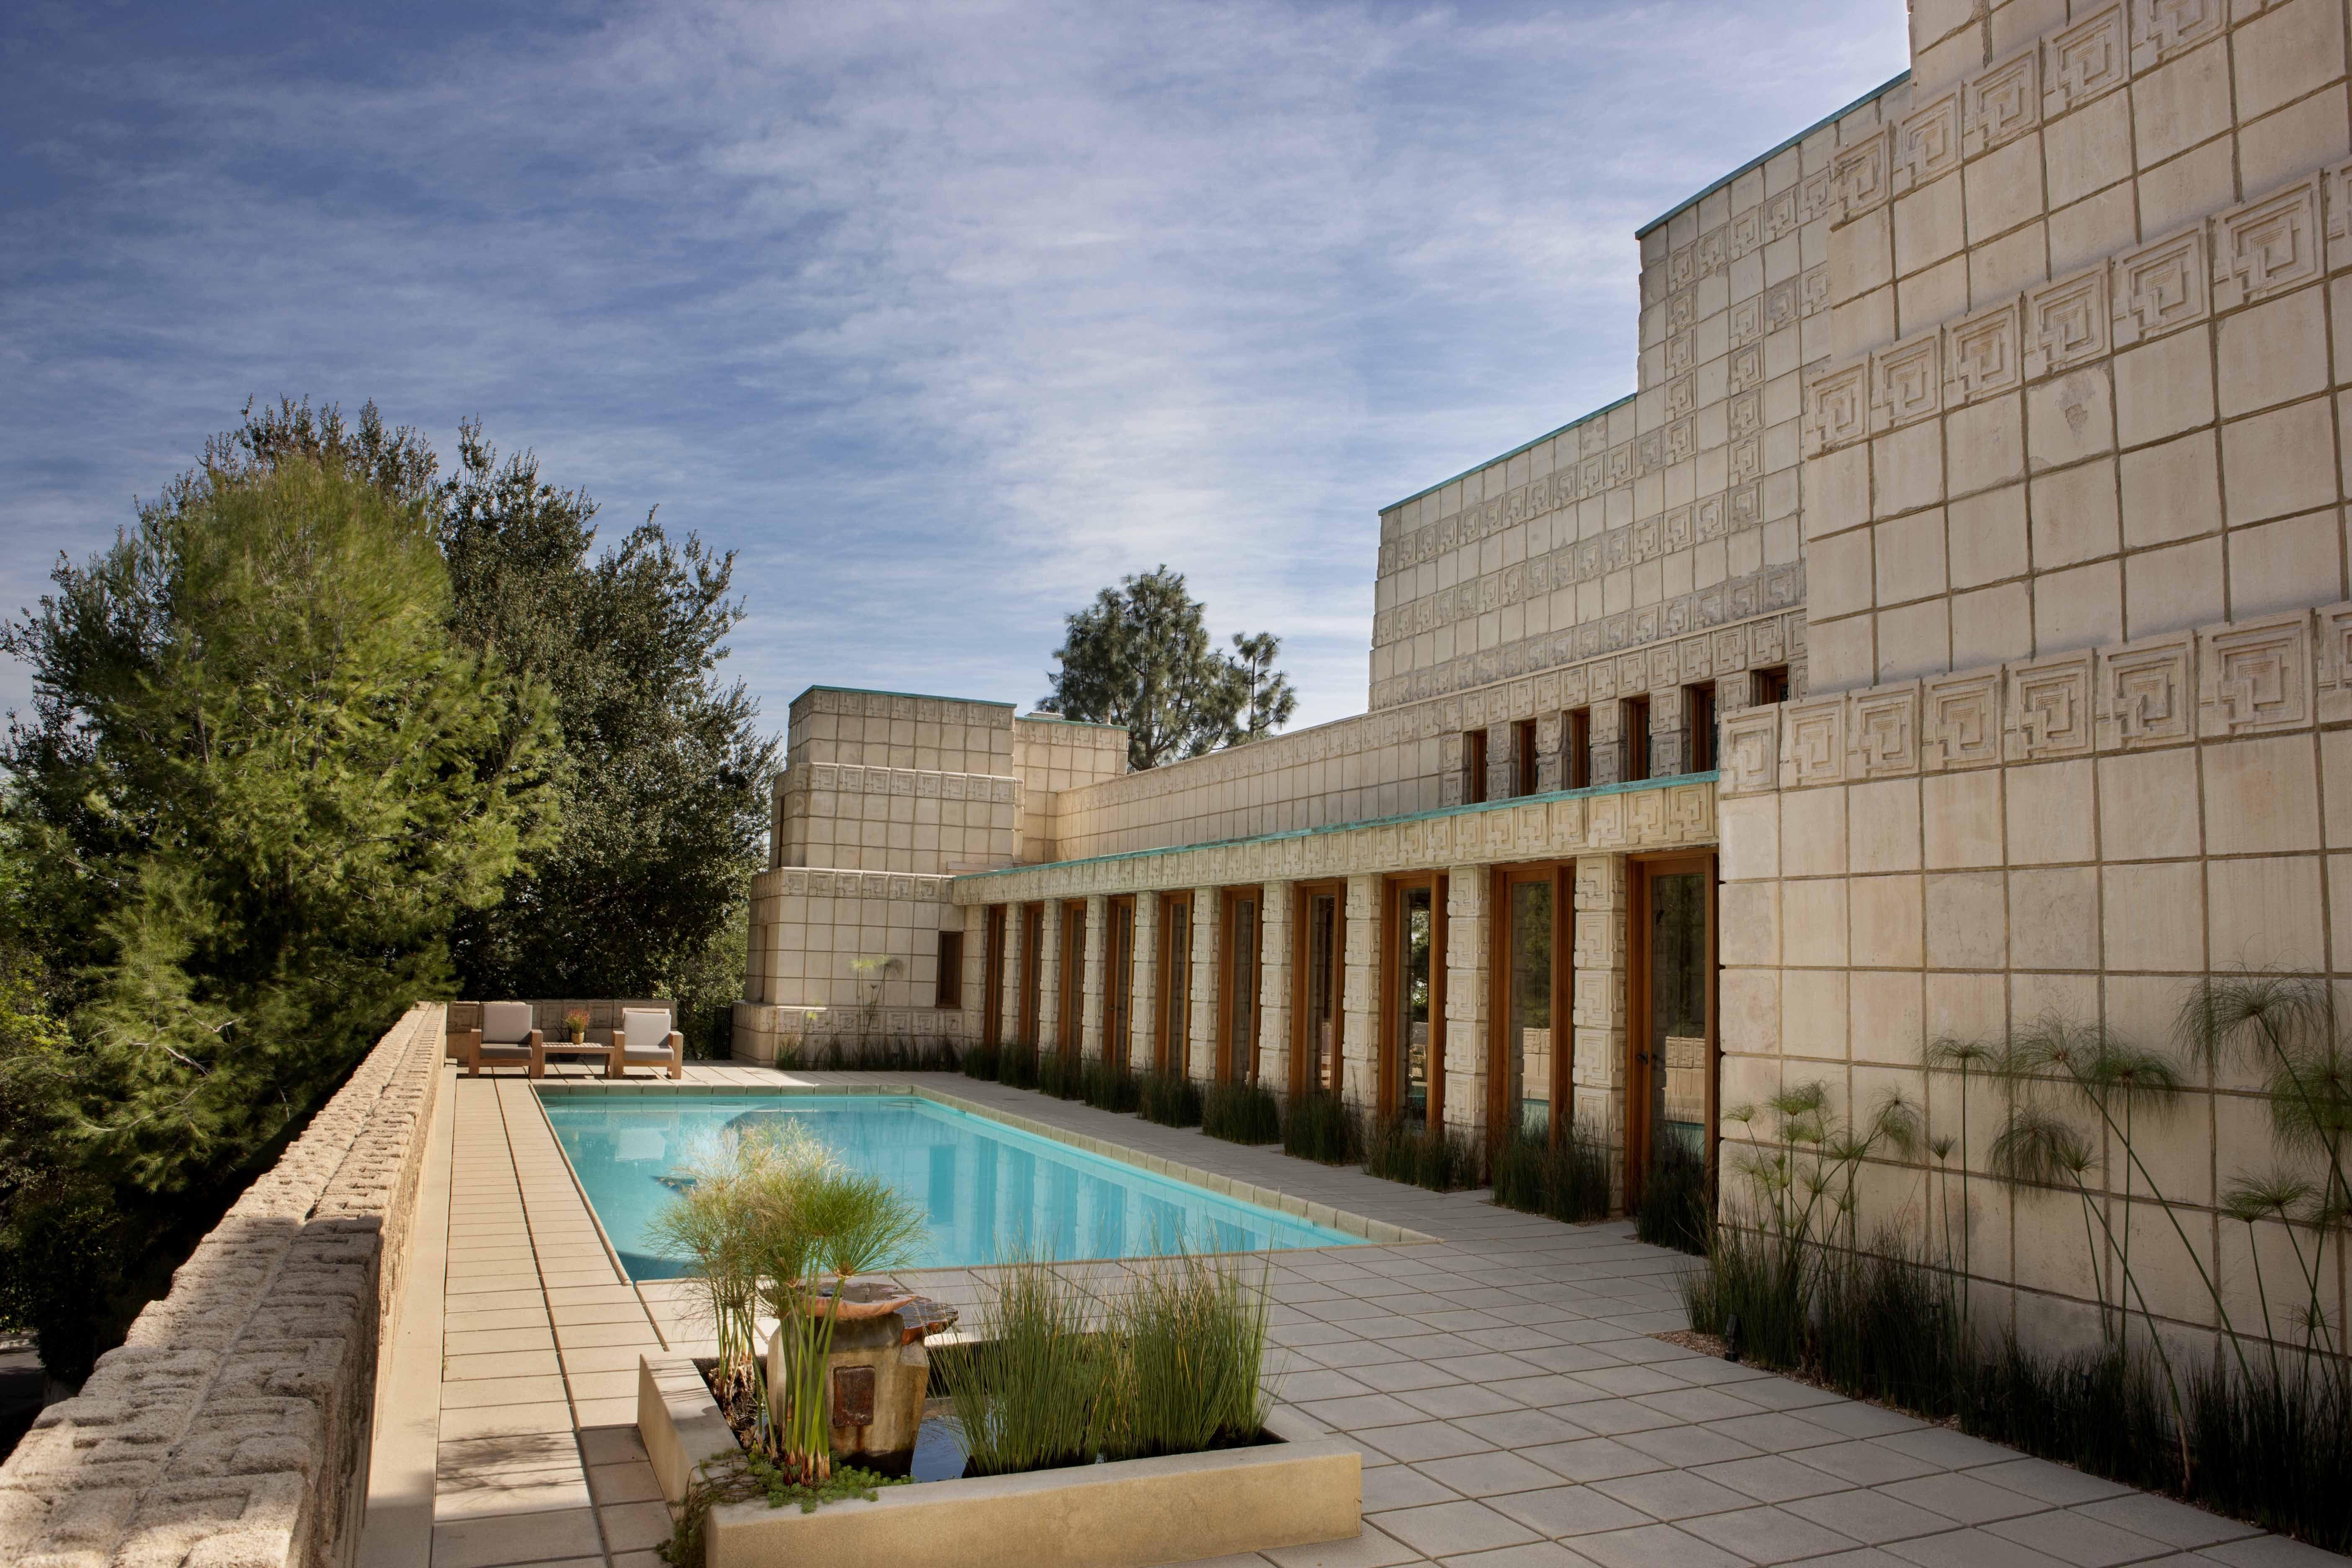 Ennis House Los Angeles